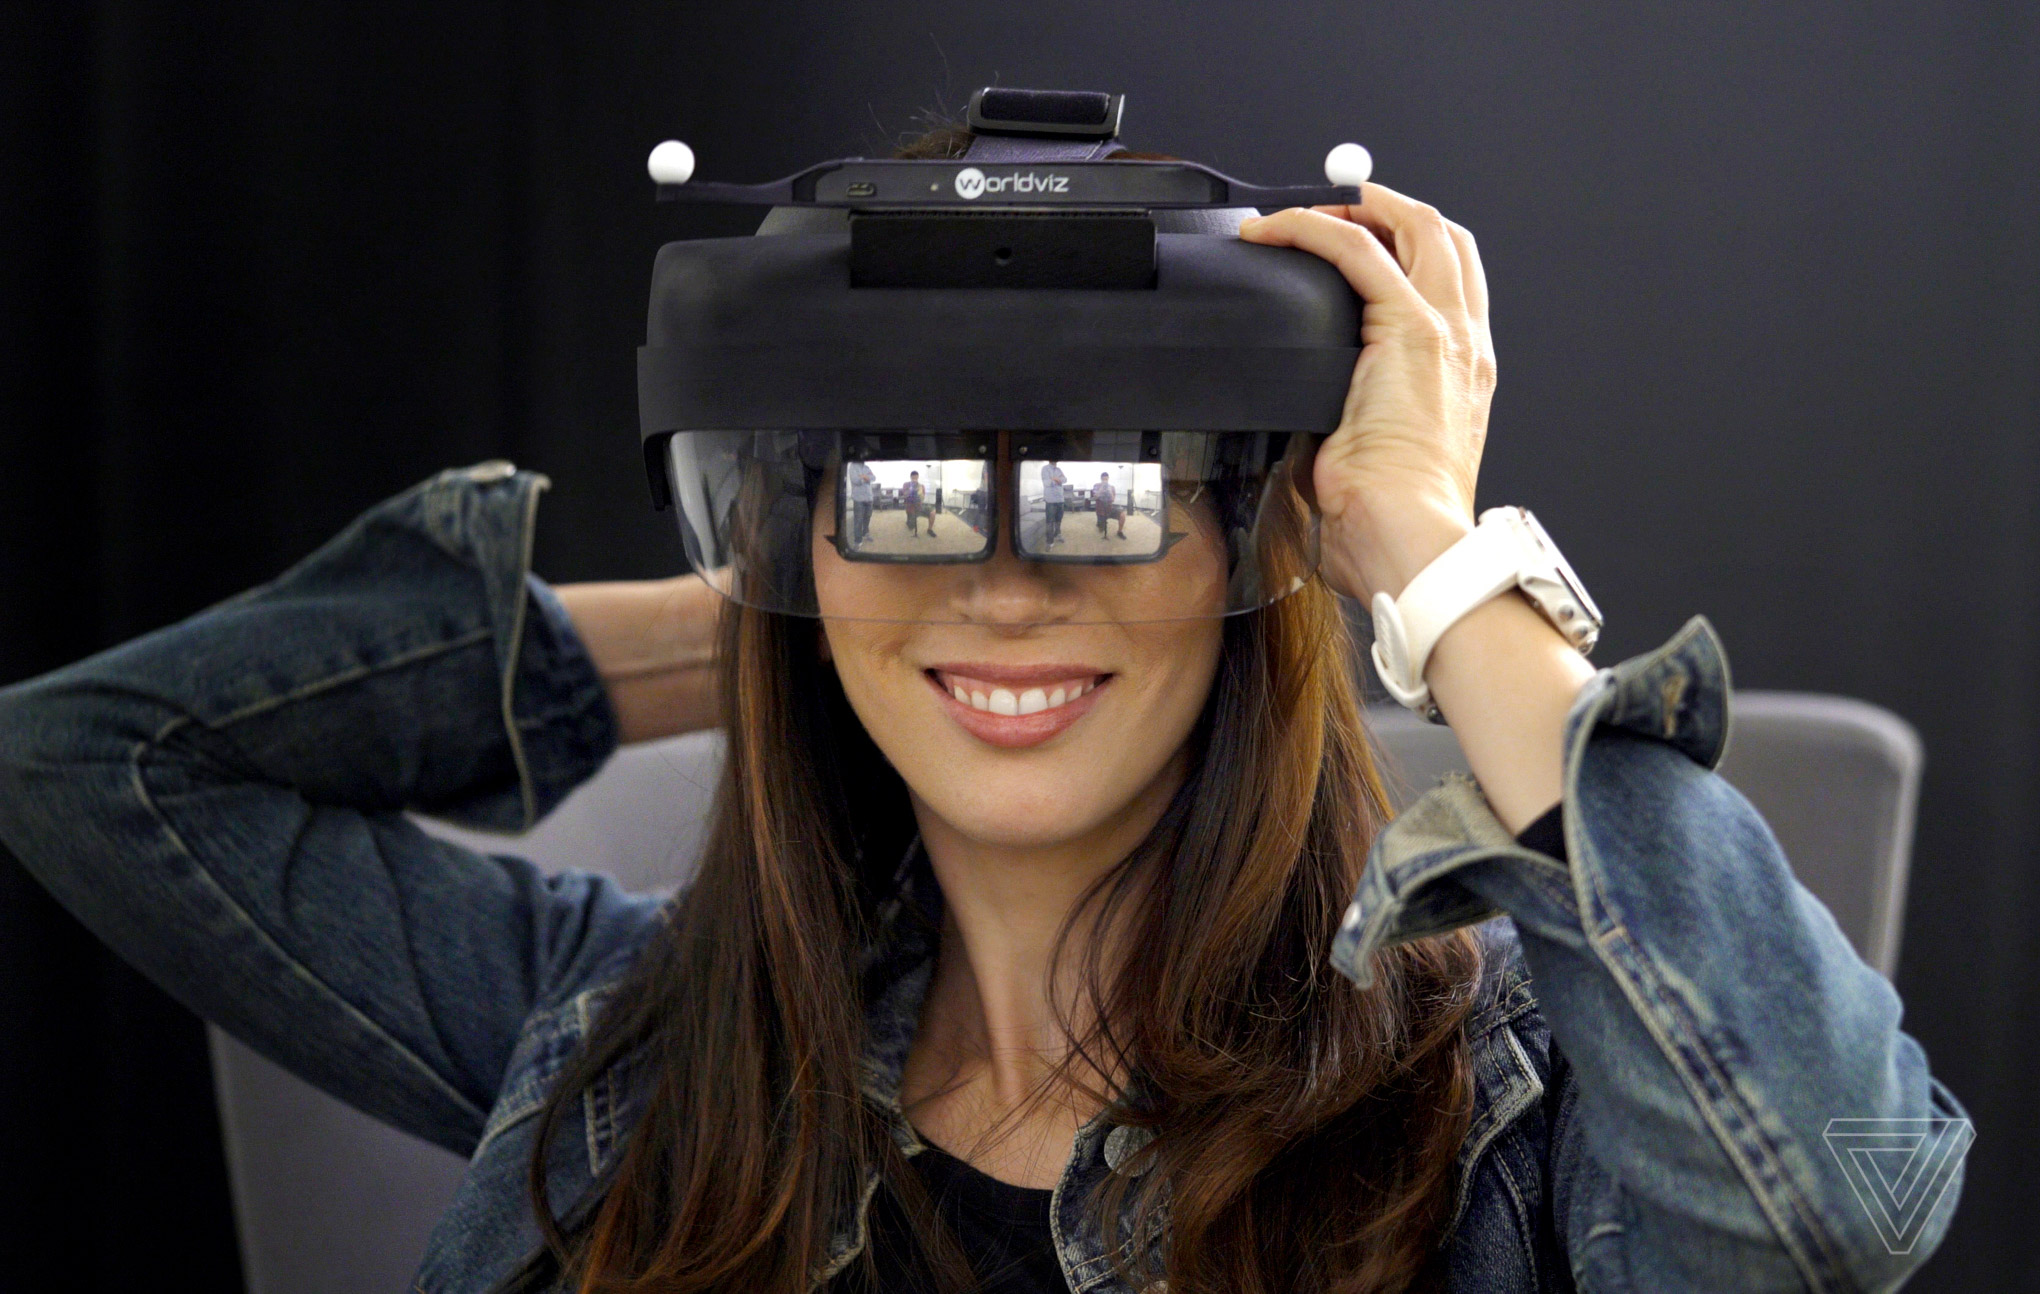 Woman wearing Avegant augmented reality headset